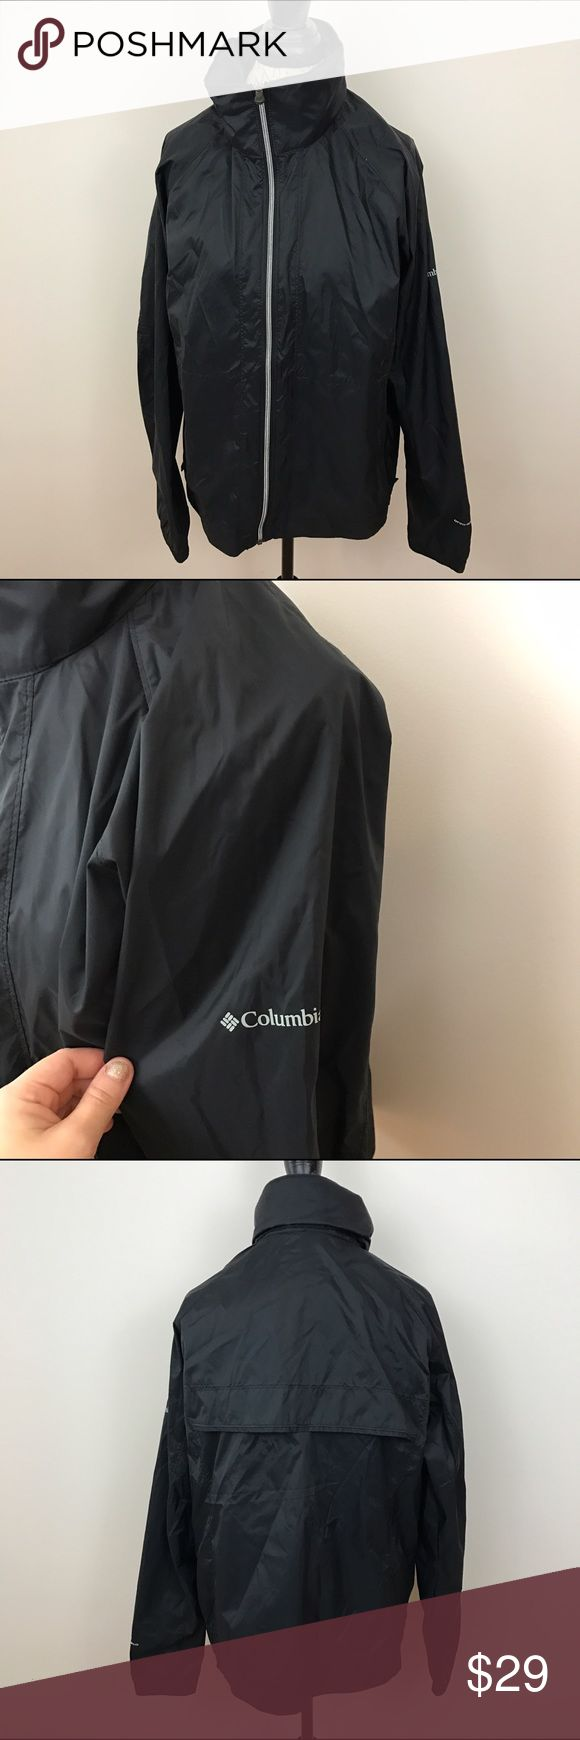 EUC! Men's Columbia Black Windbreaker Jacket. XL EUC! Men's Columbia Black Windbreaker Jacket. Hidden hood in collar. Full zipper jacket. No flaws. Size XL Columbia Jackets & Coats